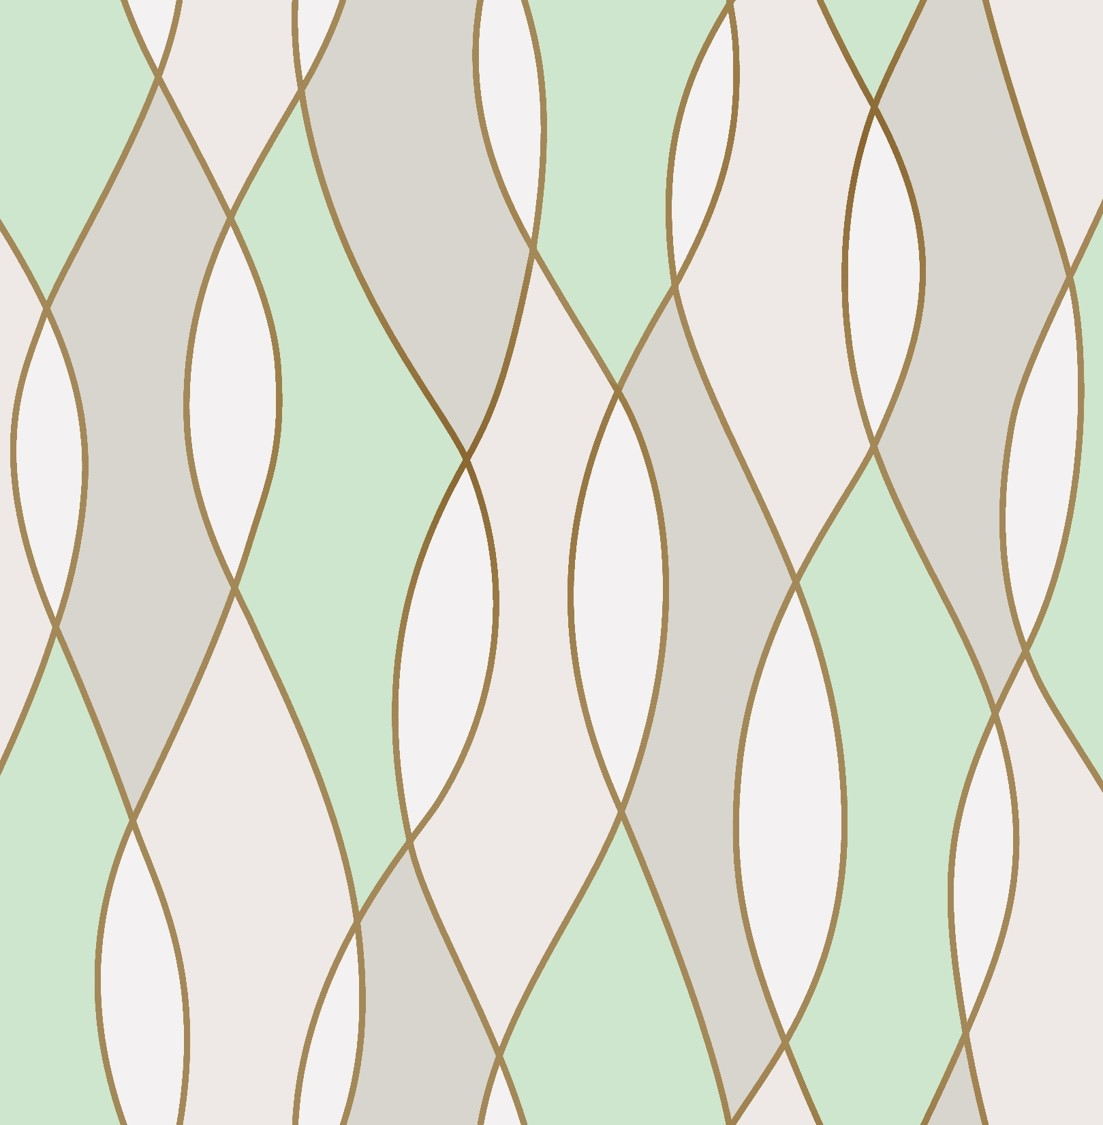 3d Effect Apex Wave Geometric Wallpaper Green White Shiny Rose Gold